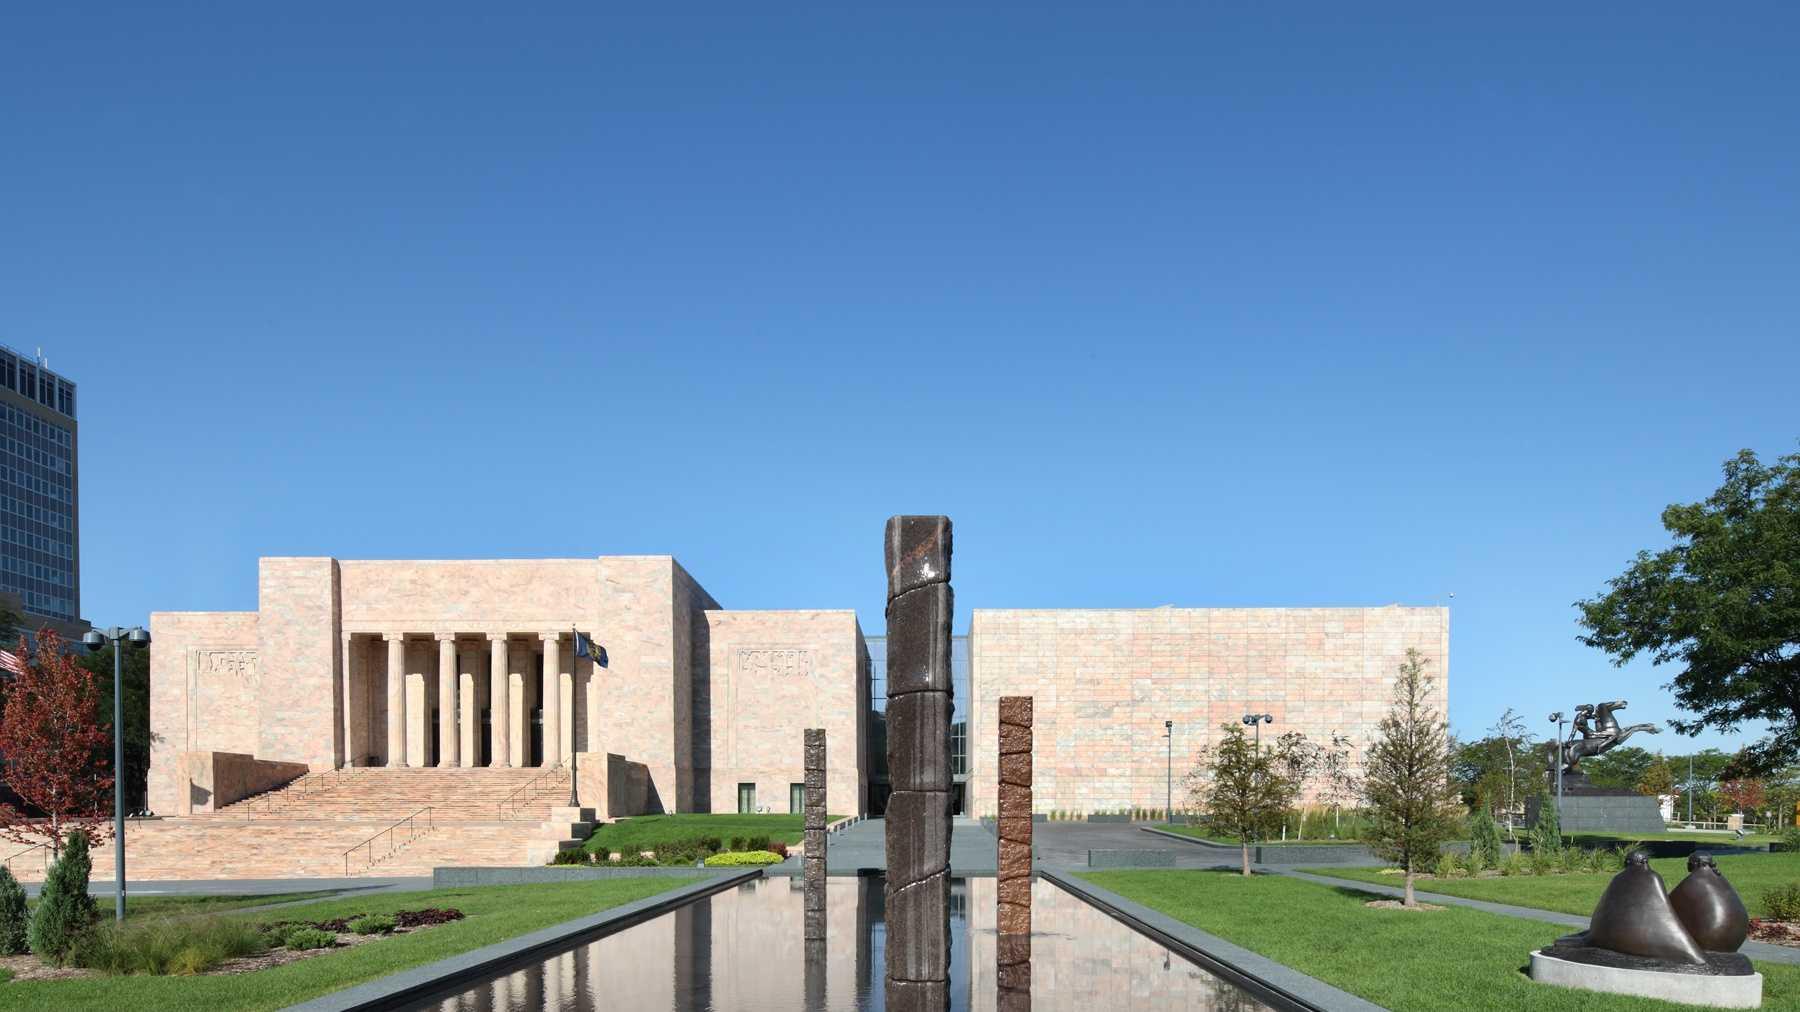 joslynartmuseum_building.jpg